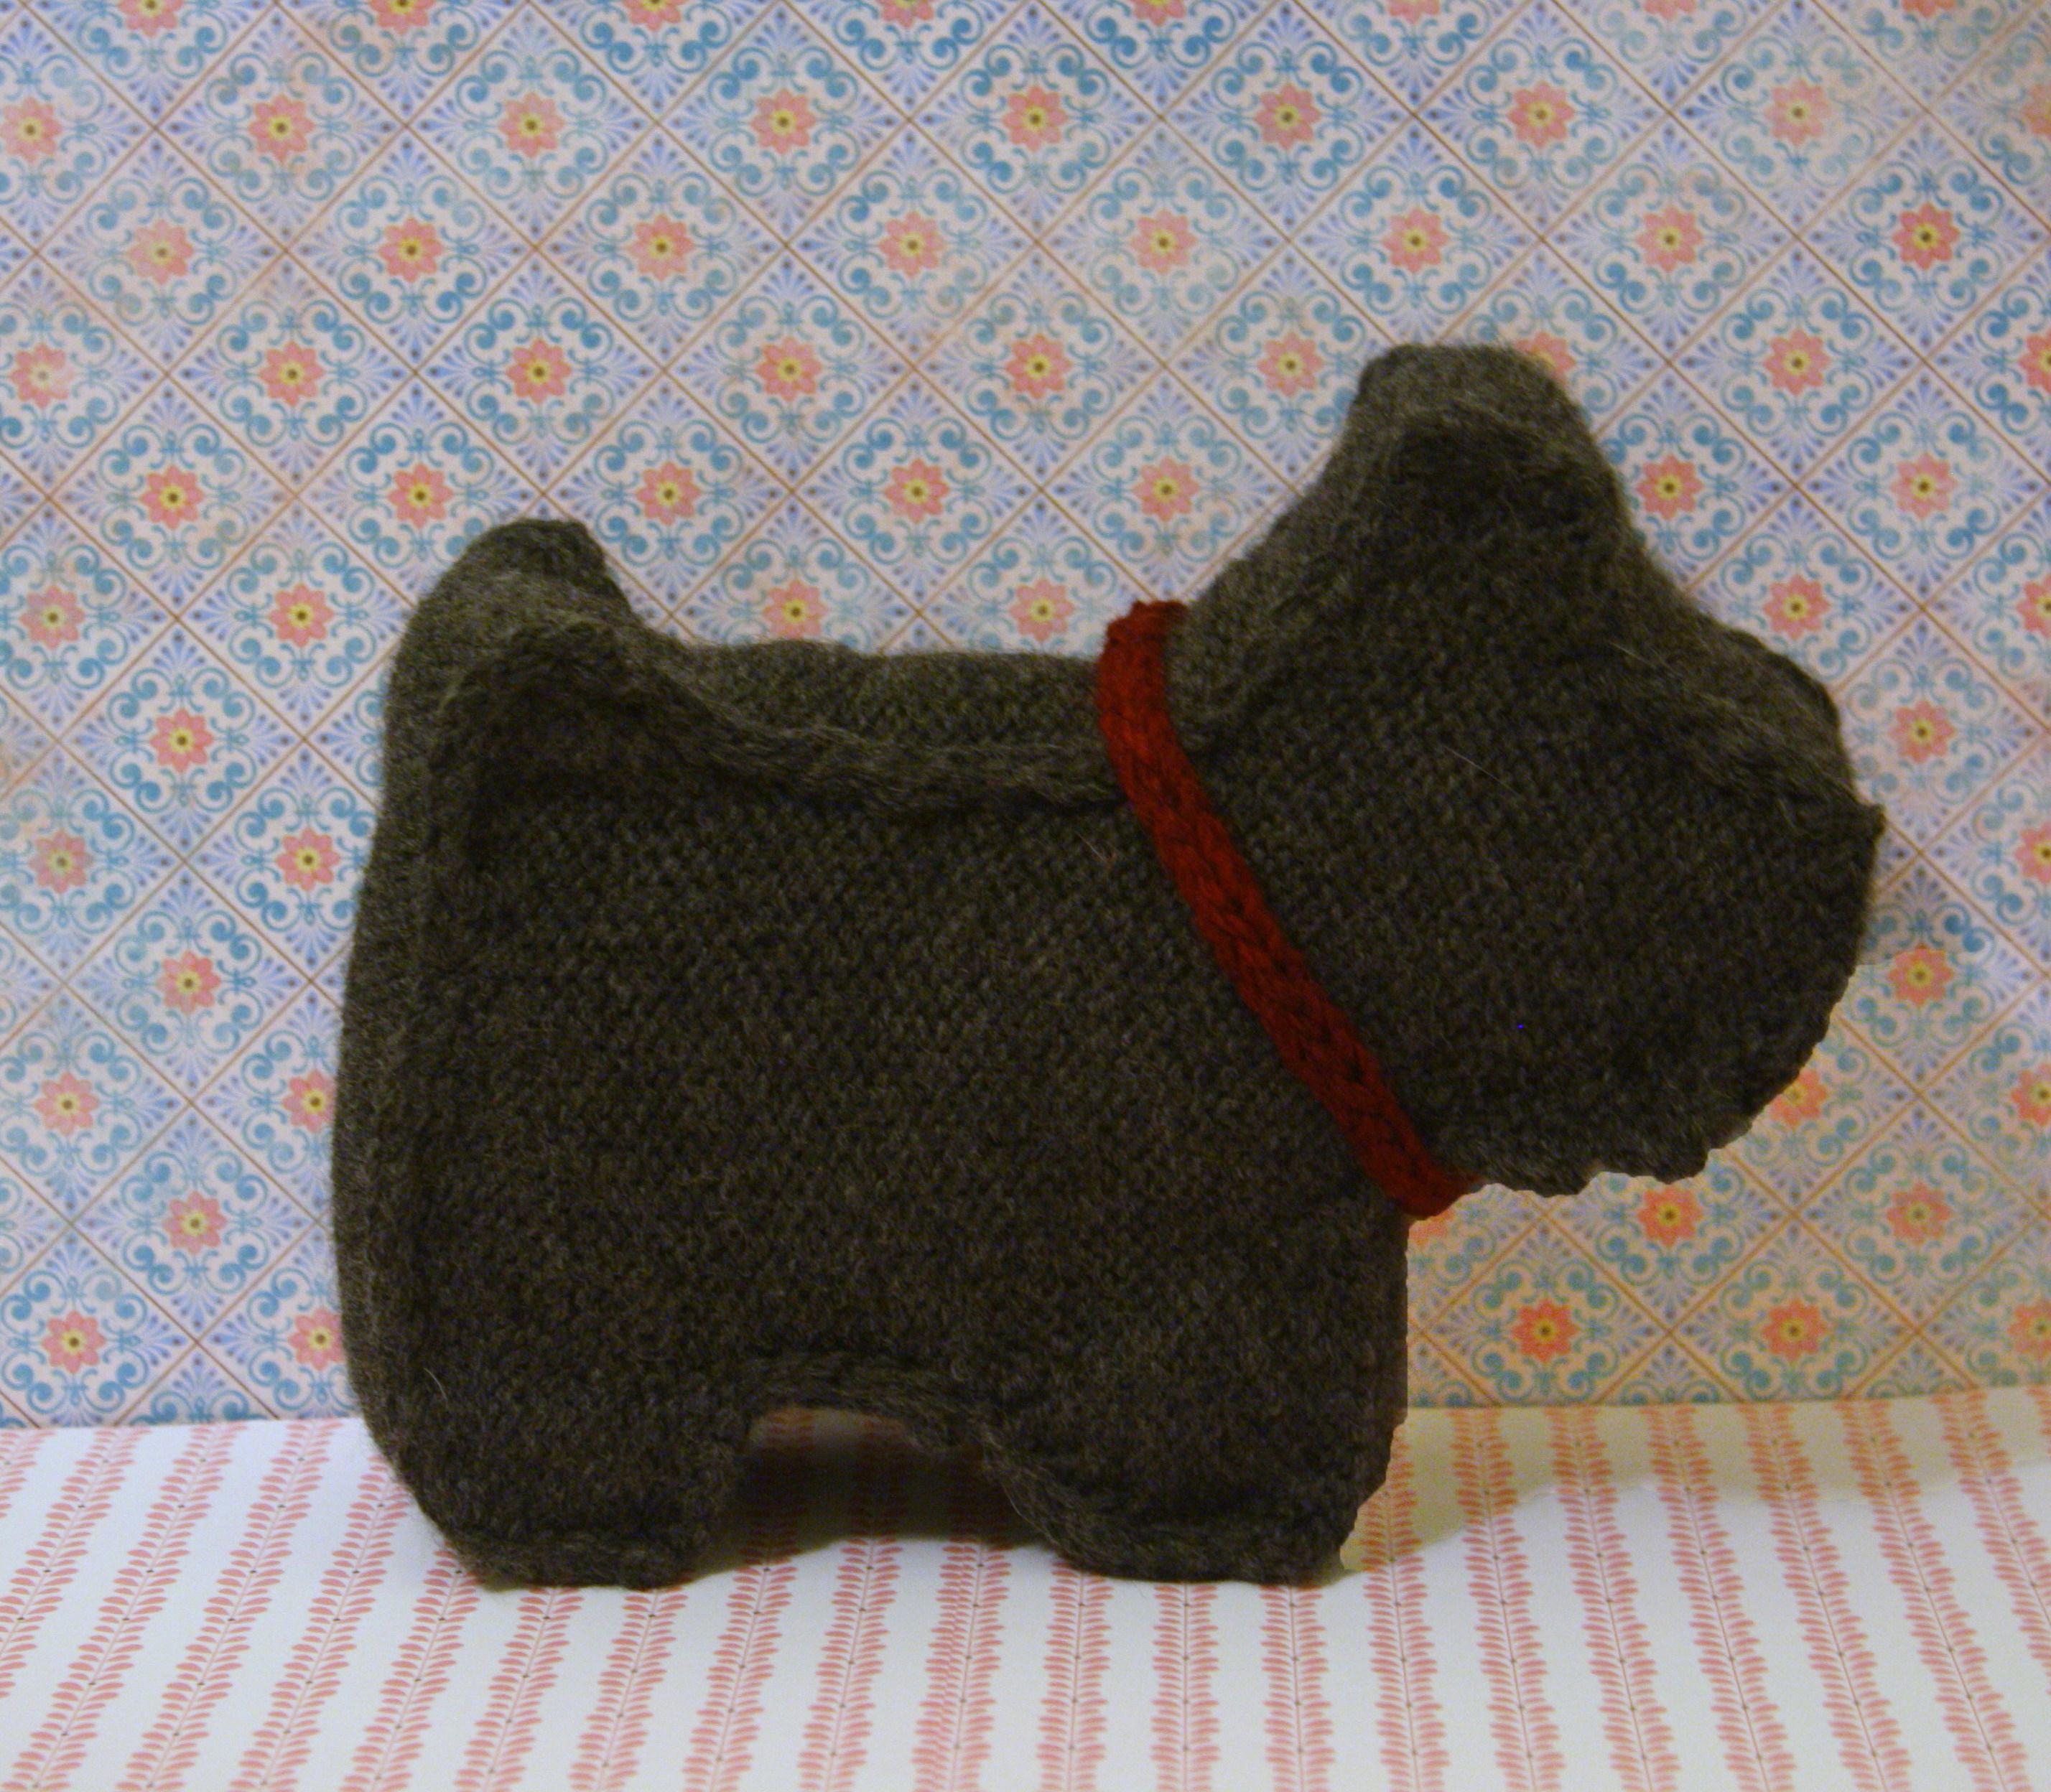 Free Knitting Pattern For Radley Dog : Wool Week Day 1: Radley!   Kitty Knits